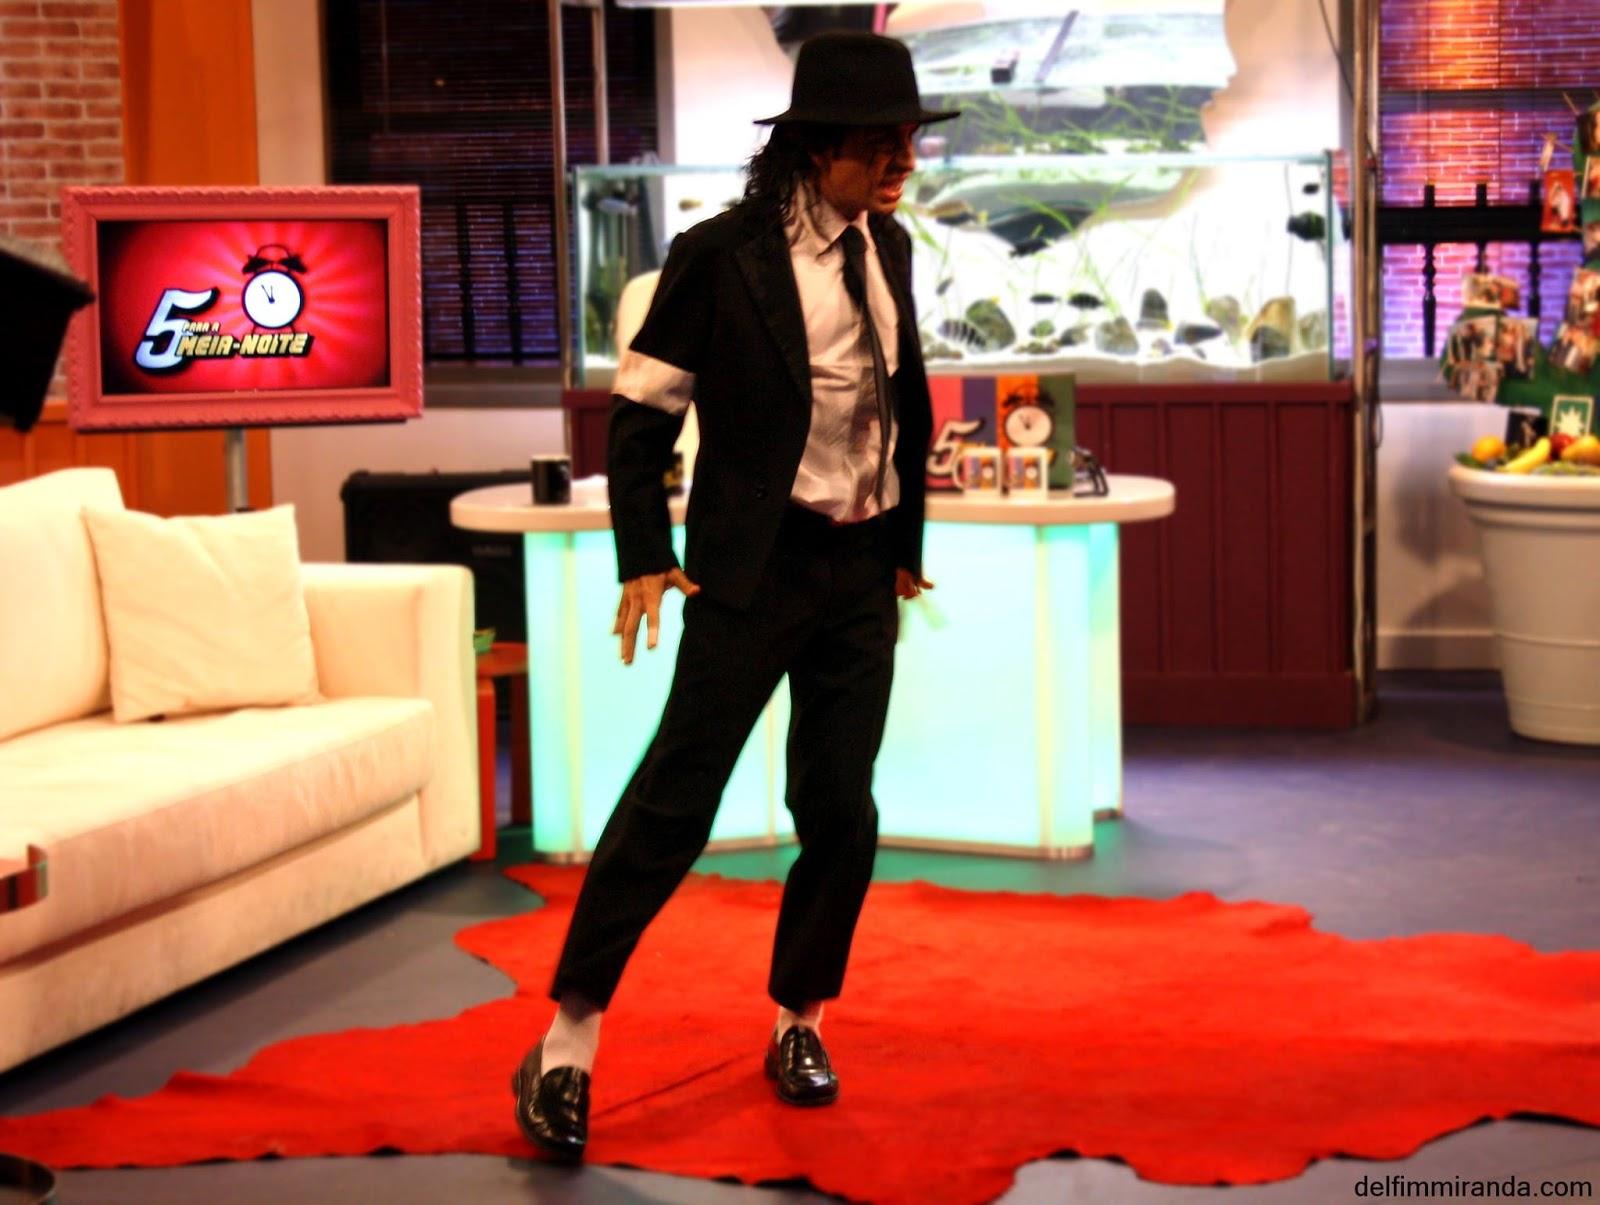 Delfim Miranda - Michael Jackson Tribute - TV performance - 5 para a meia-noite - RTP - Smooth Criminal